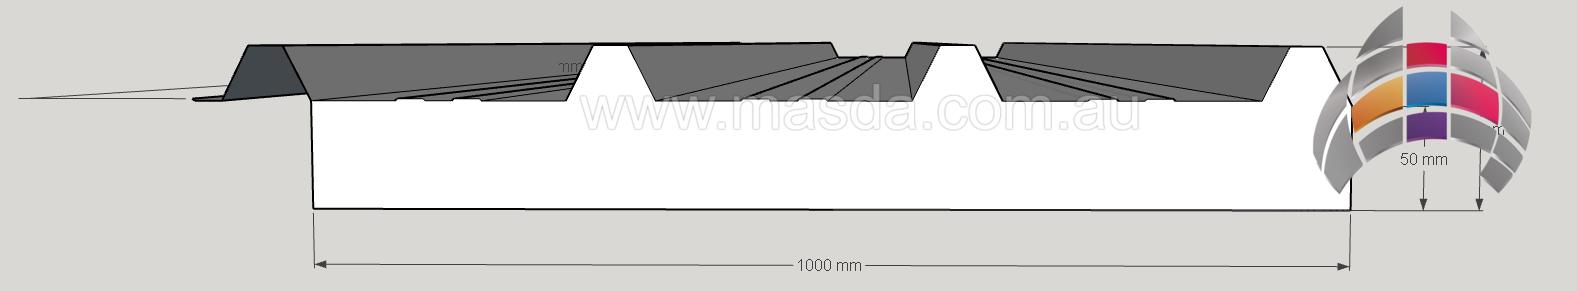 Masda Roof Panel 50mm_3